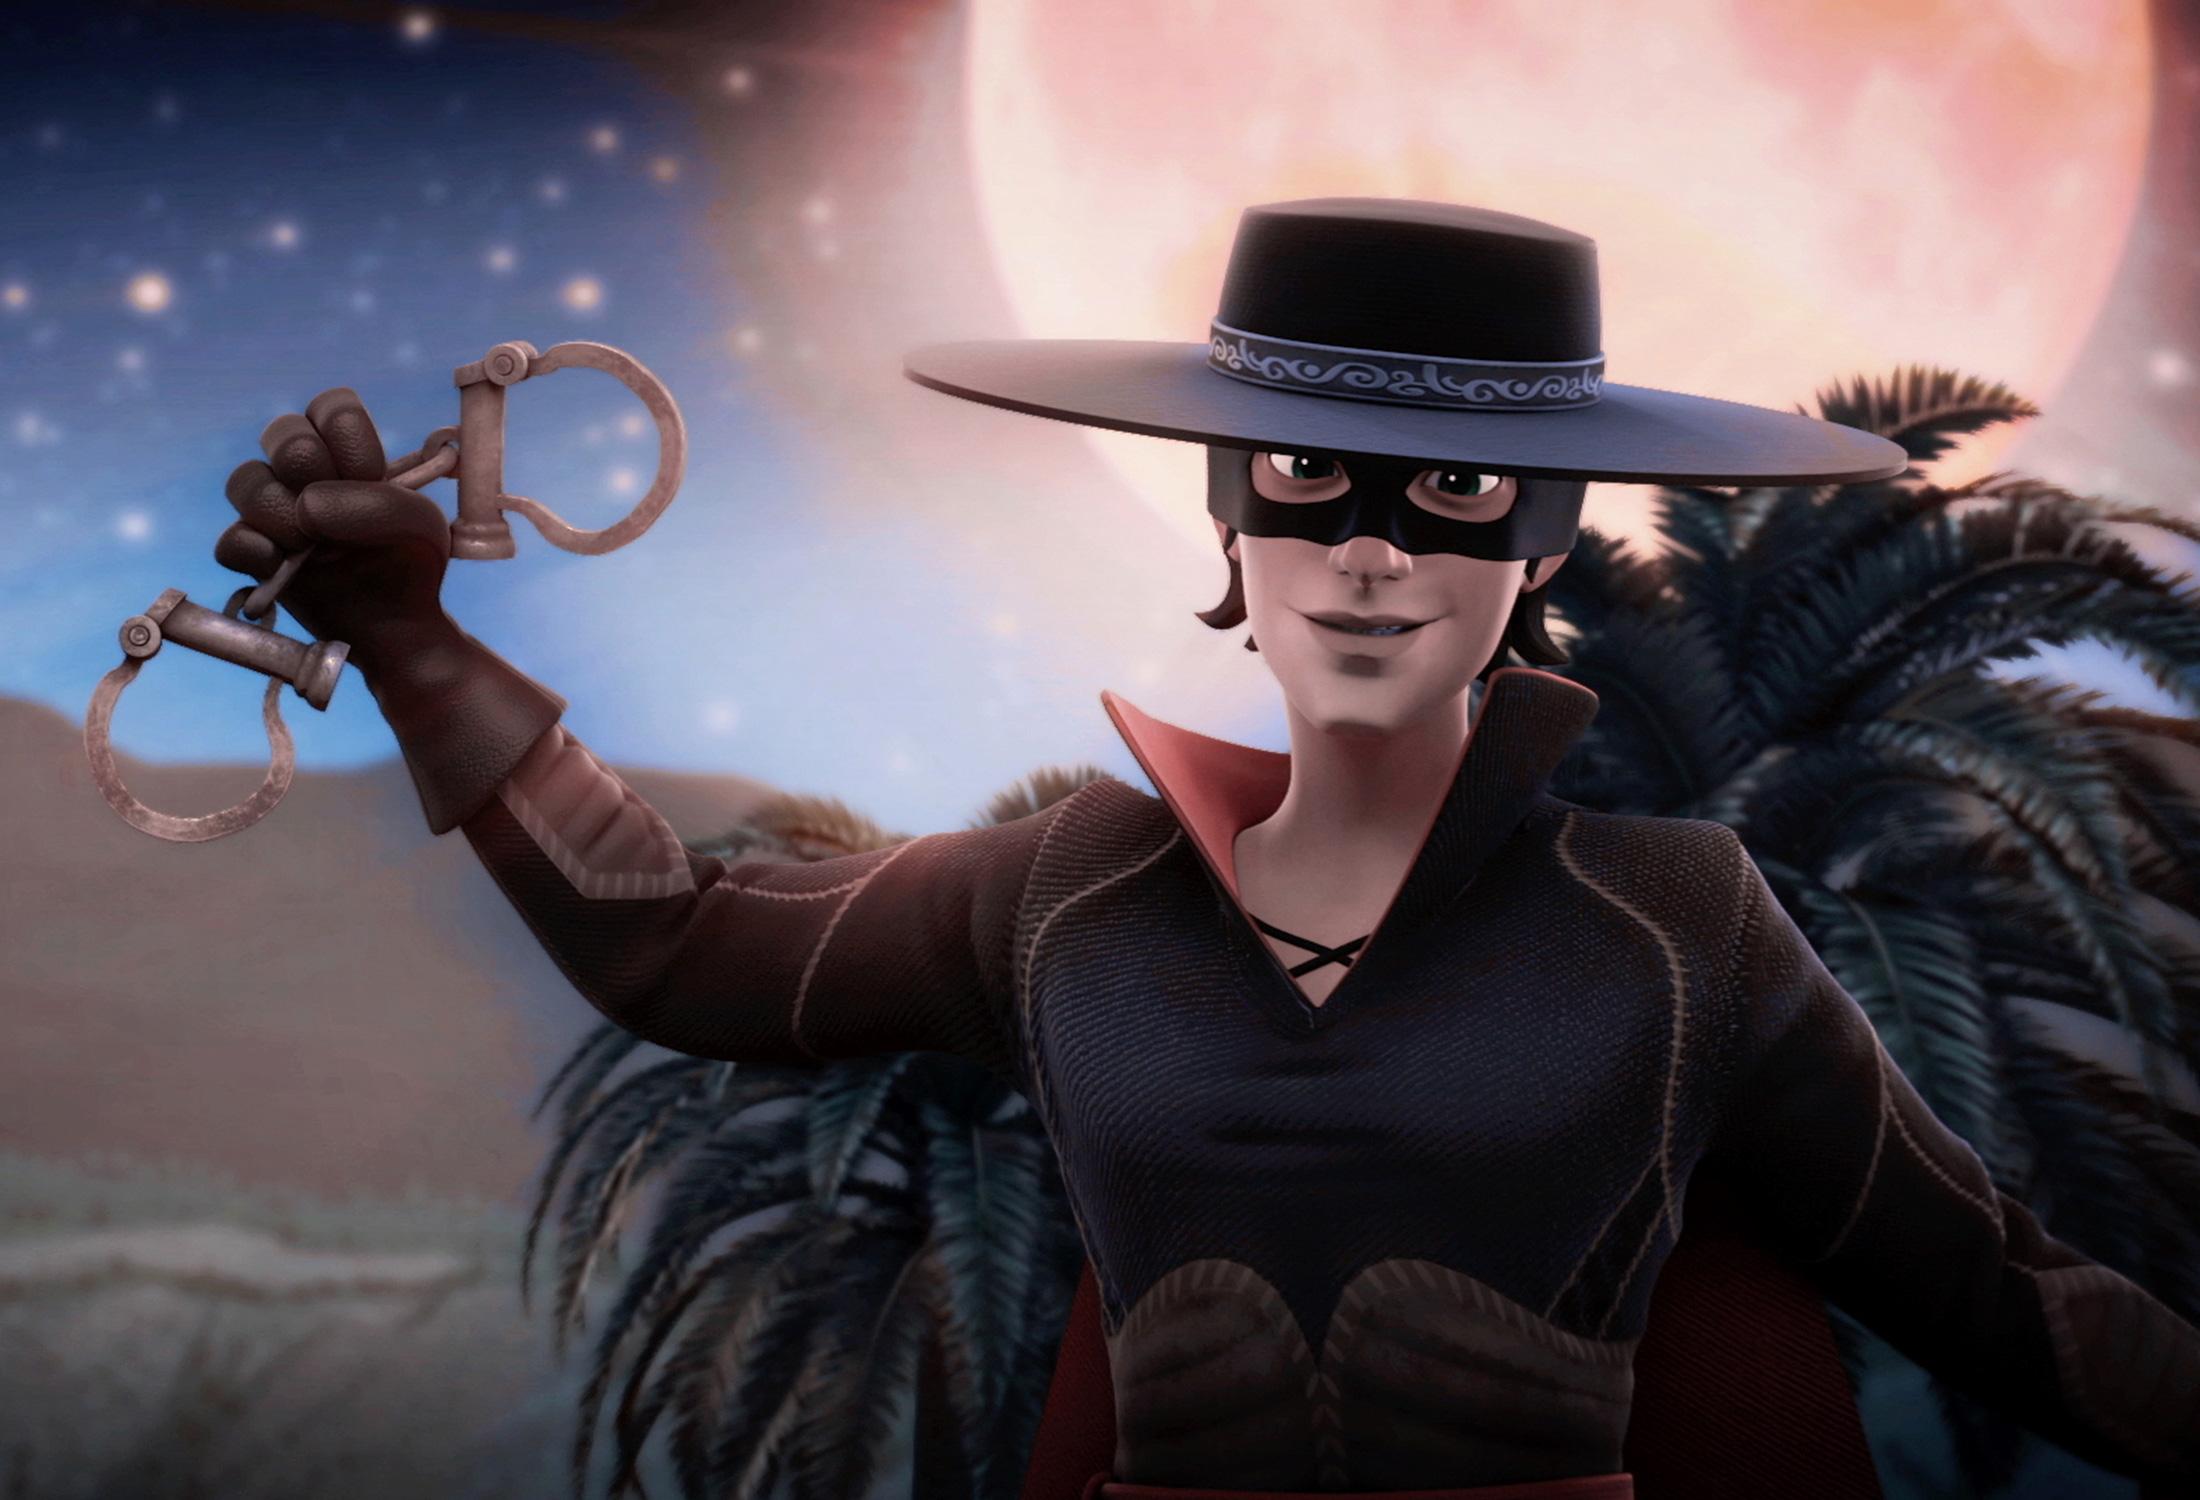 As Crónicas do Zorro